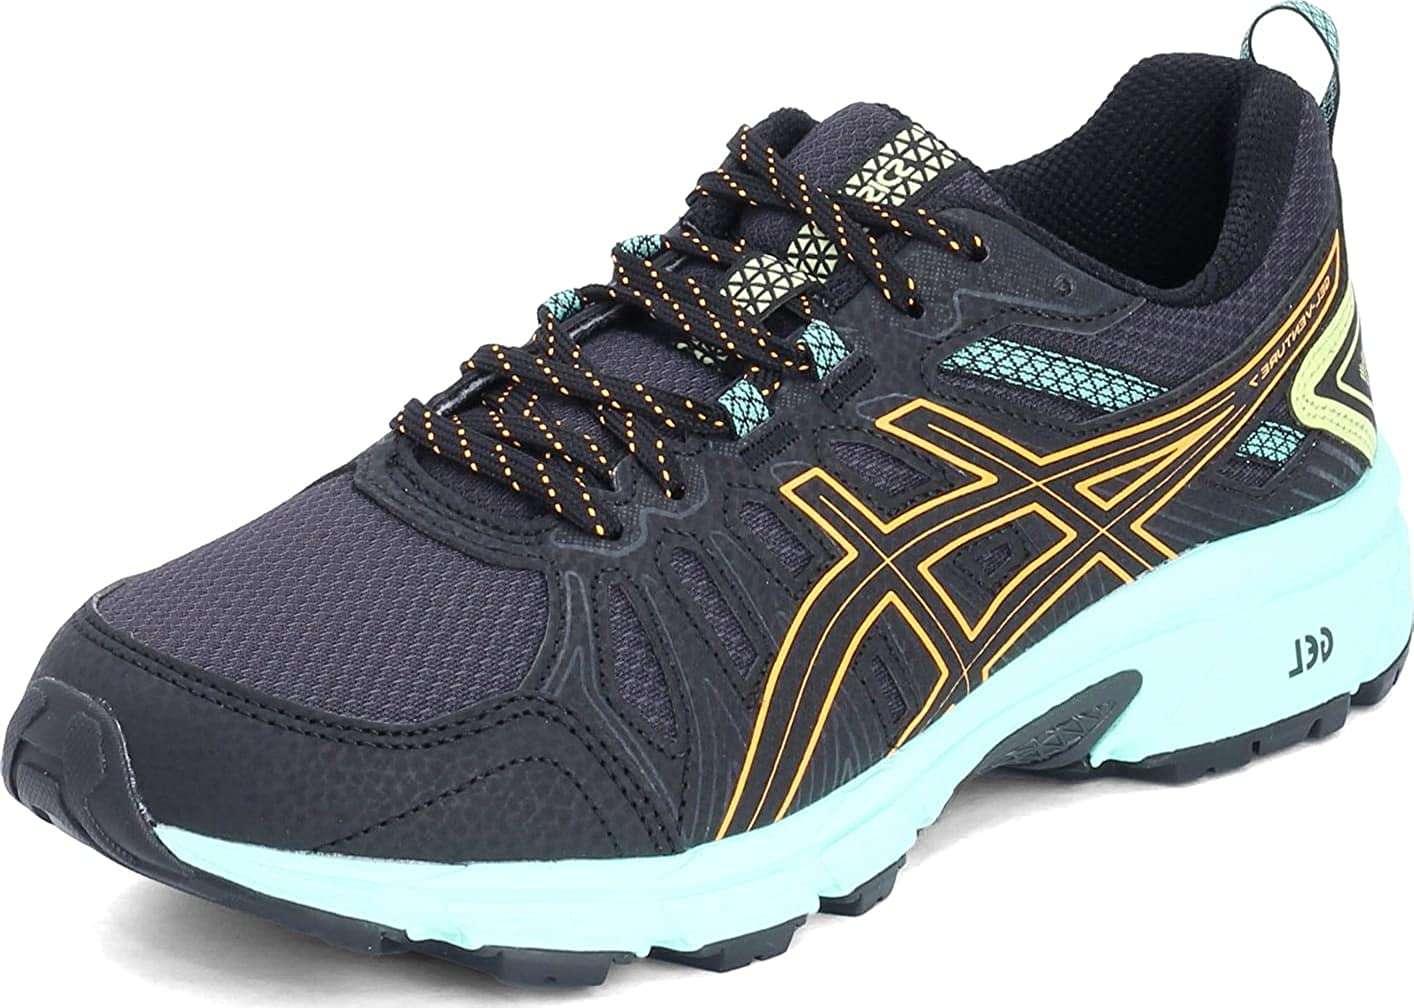 ASICS Gel Venture 7 Running Shoe